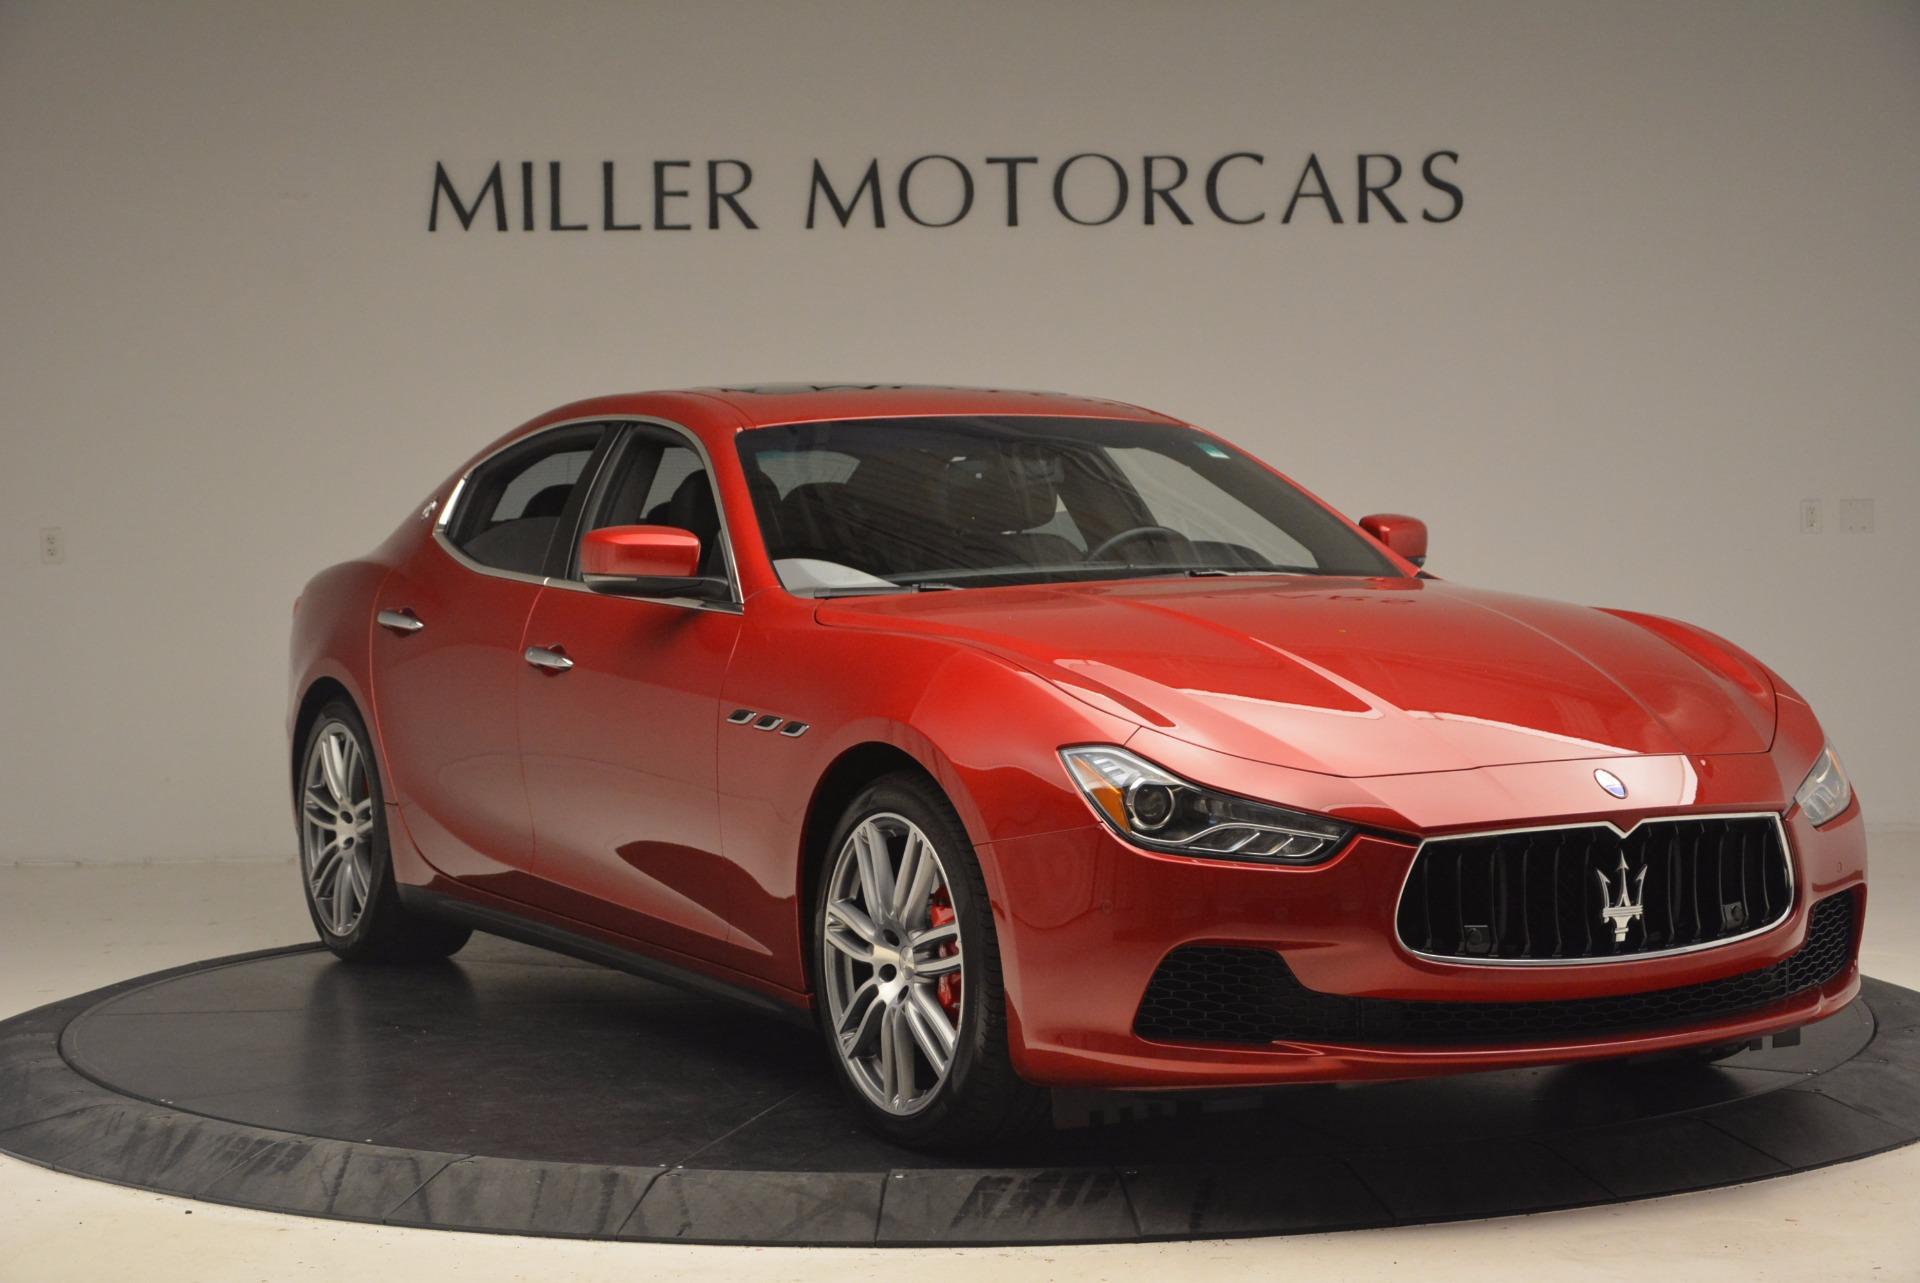 Used 2014 Maserati Ghibli S Q4 For Sale In Greenwich, CT. Alfa Romeo of Greenwich, 7203 1158_p11